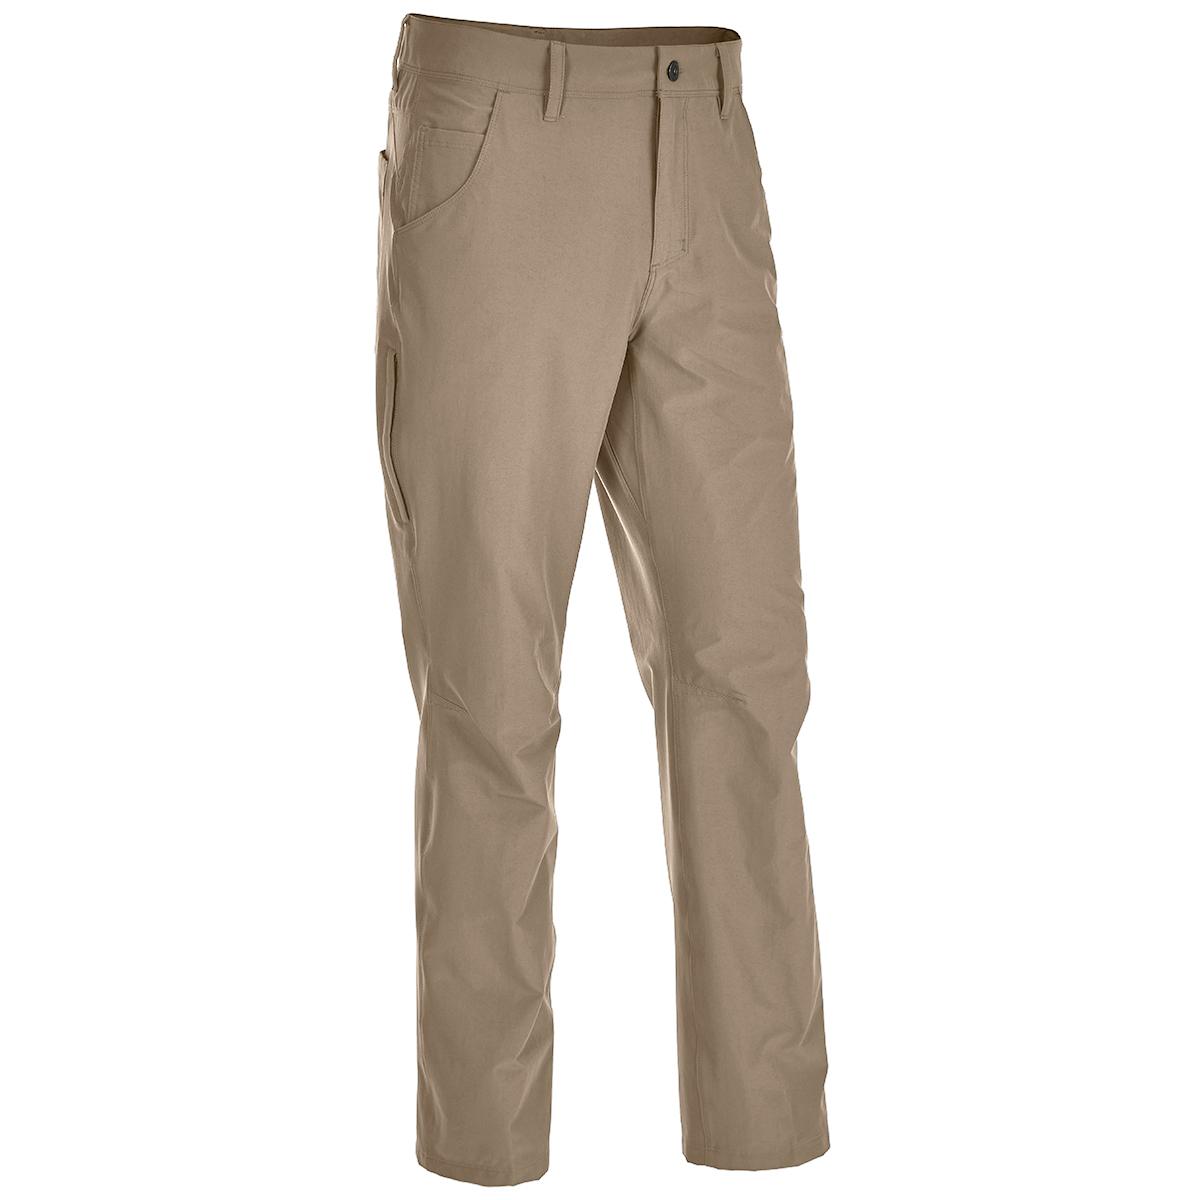 Ems Men's Go East Pants - Brown, 36/30